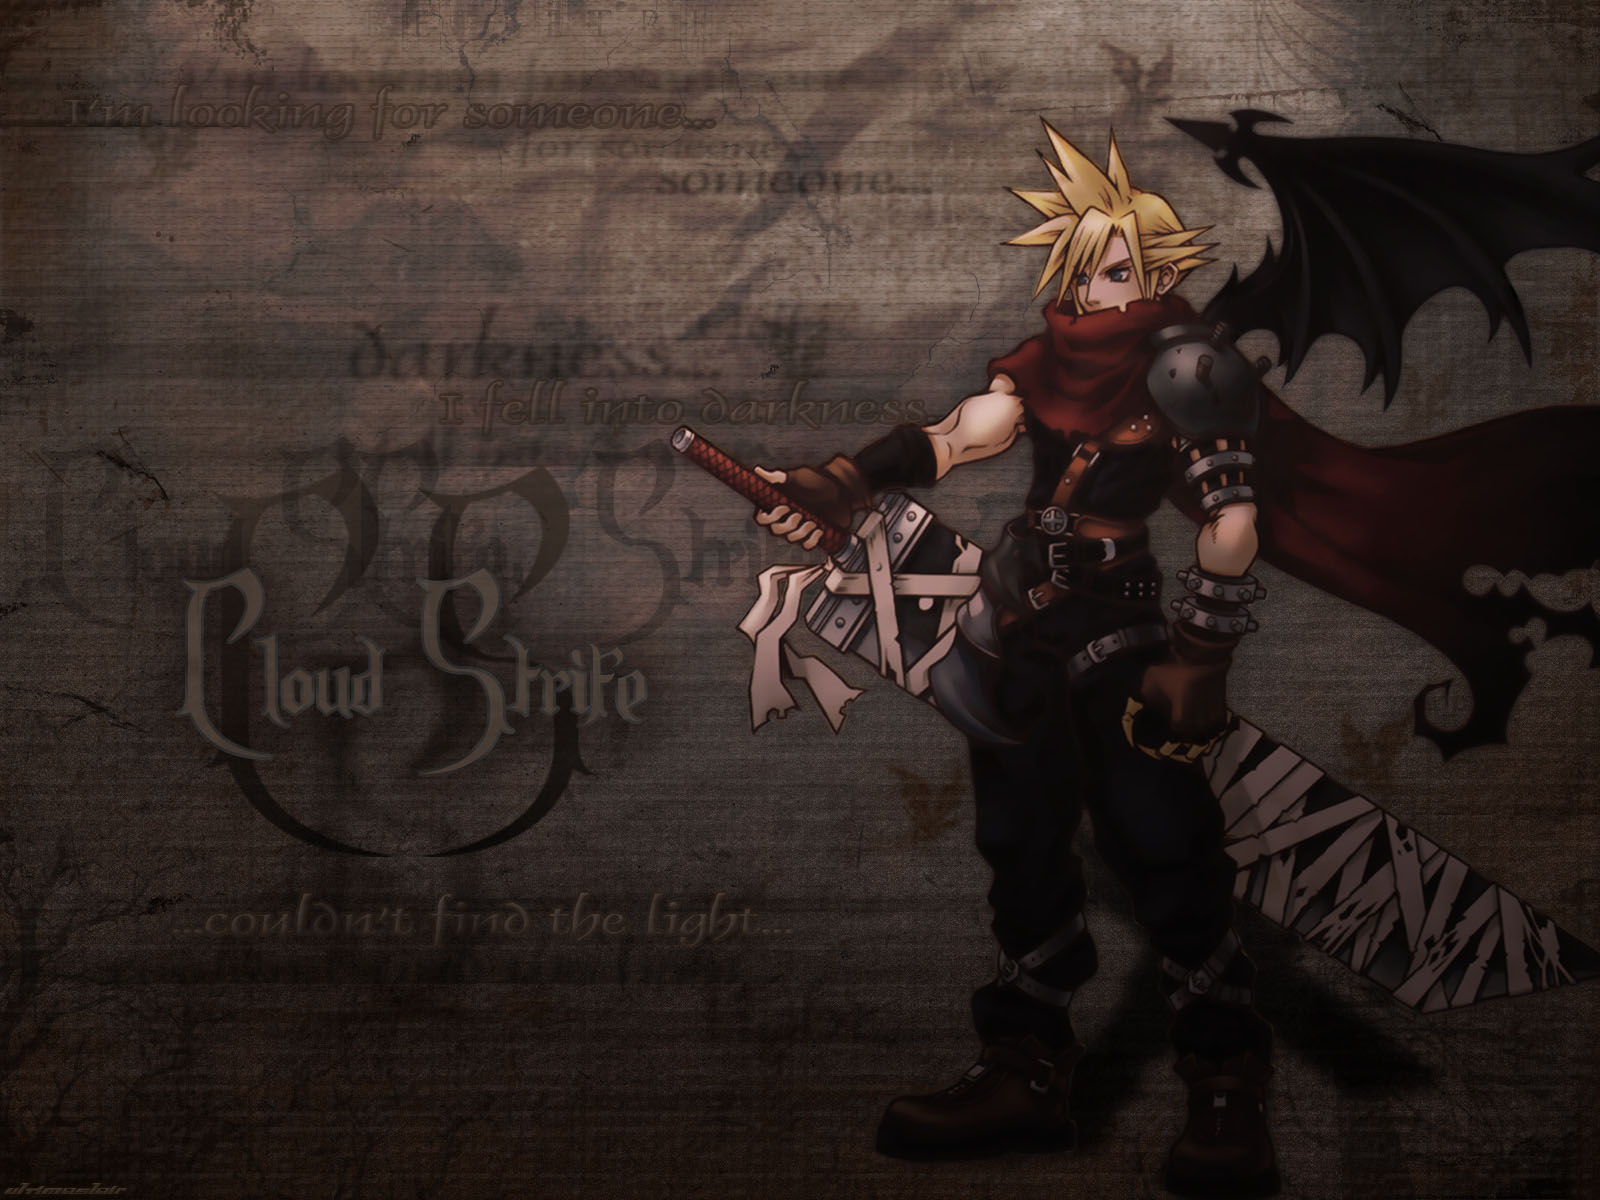 cloud_strife final_fantasy final_fantasy_vii kingdom_hearts scarf sword weapon